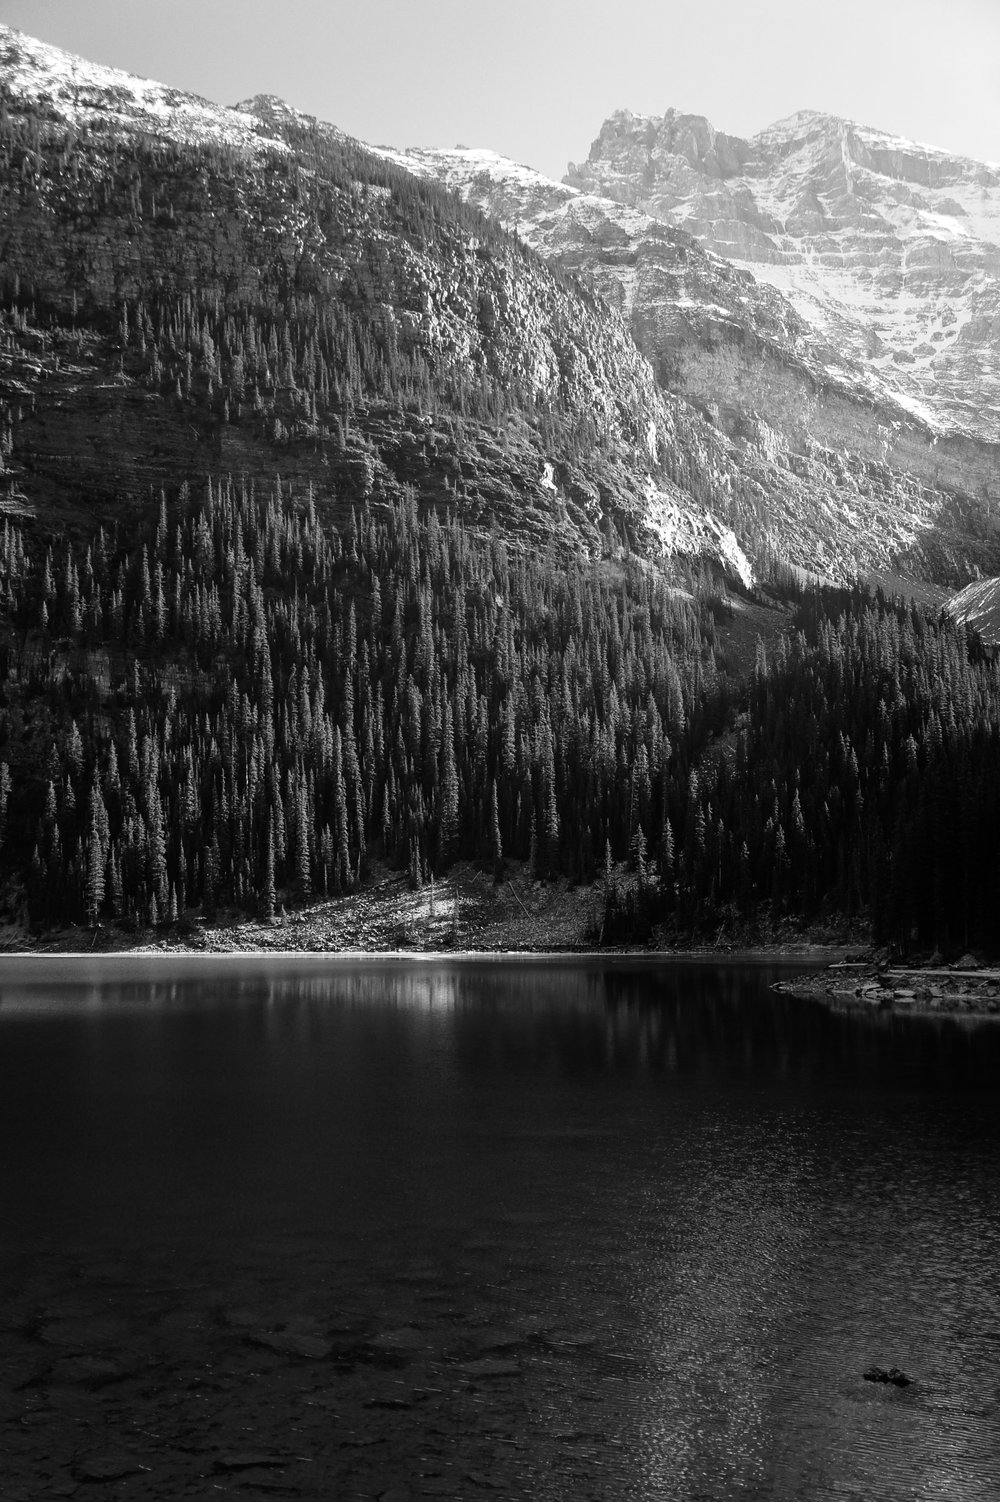 Samuel_Hesketh_Photography-2.jpg